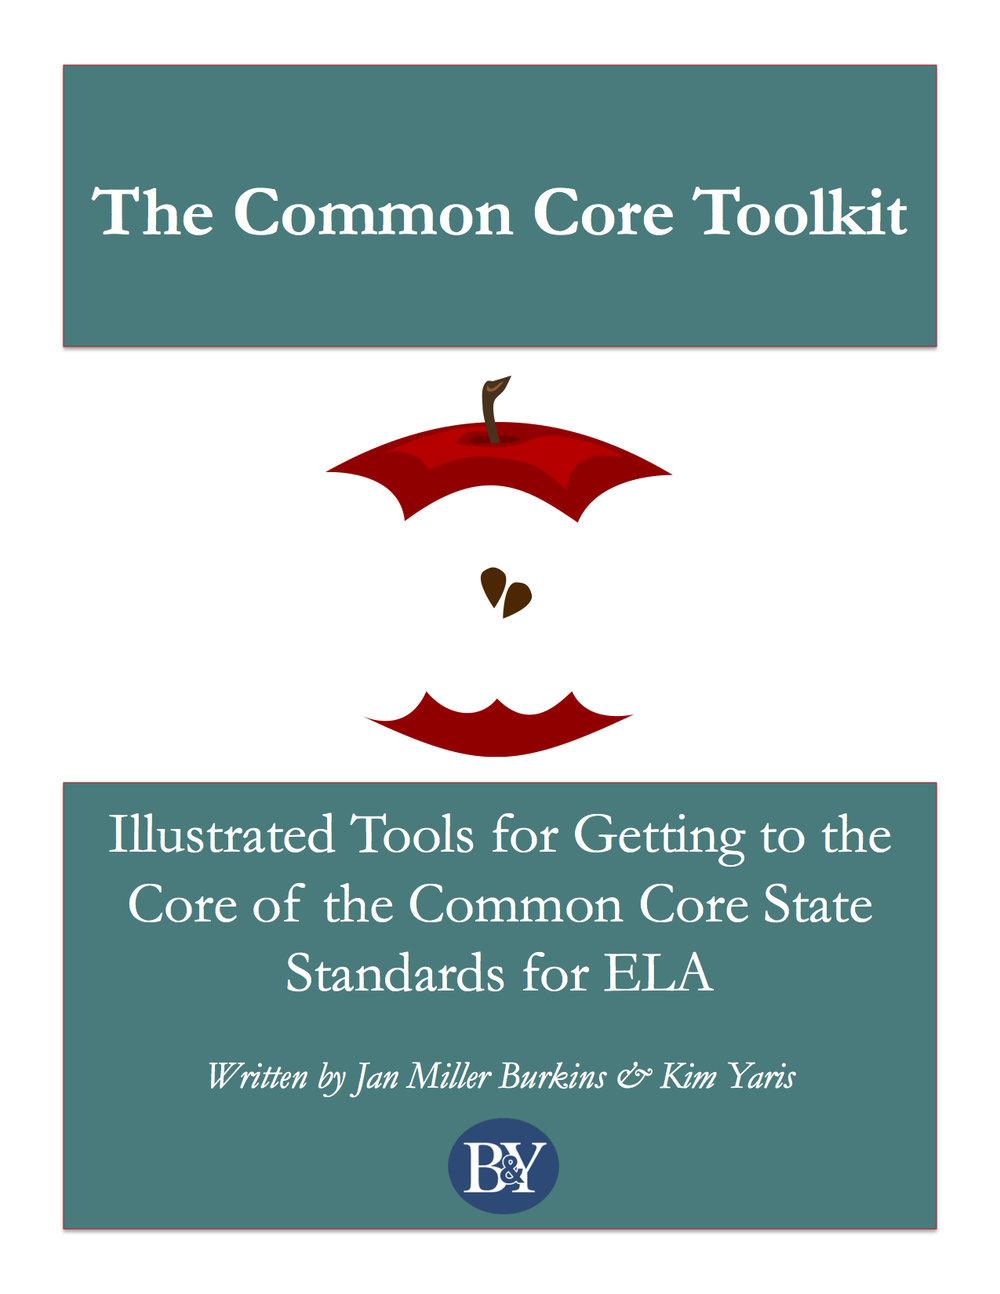 Common-Core-Toolkit_BurkinsandYaris_7-24-13.jpg